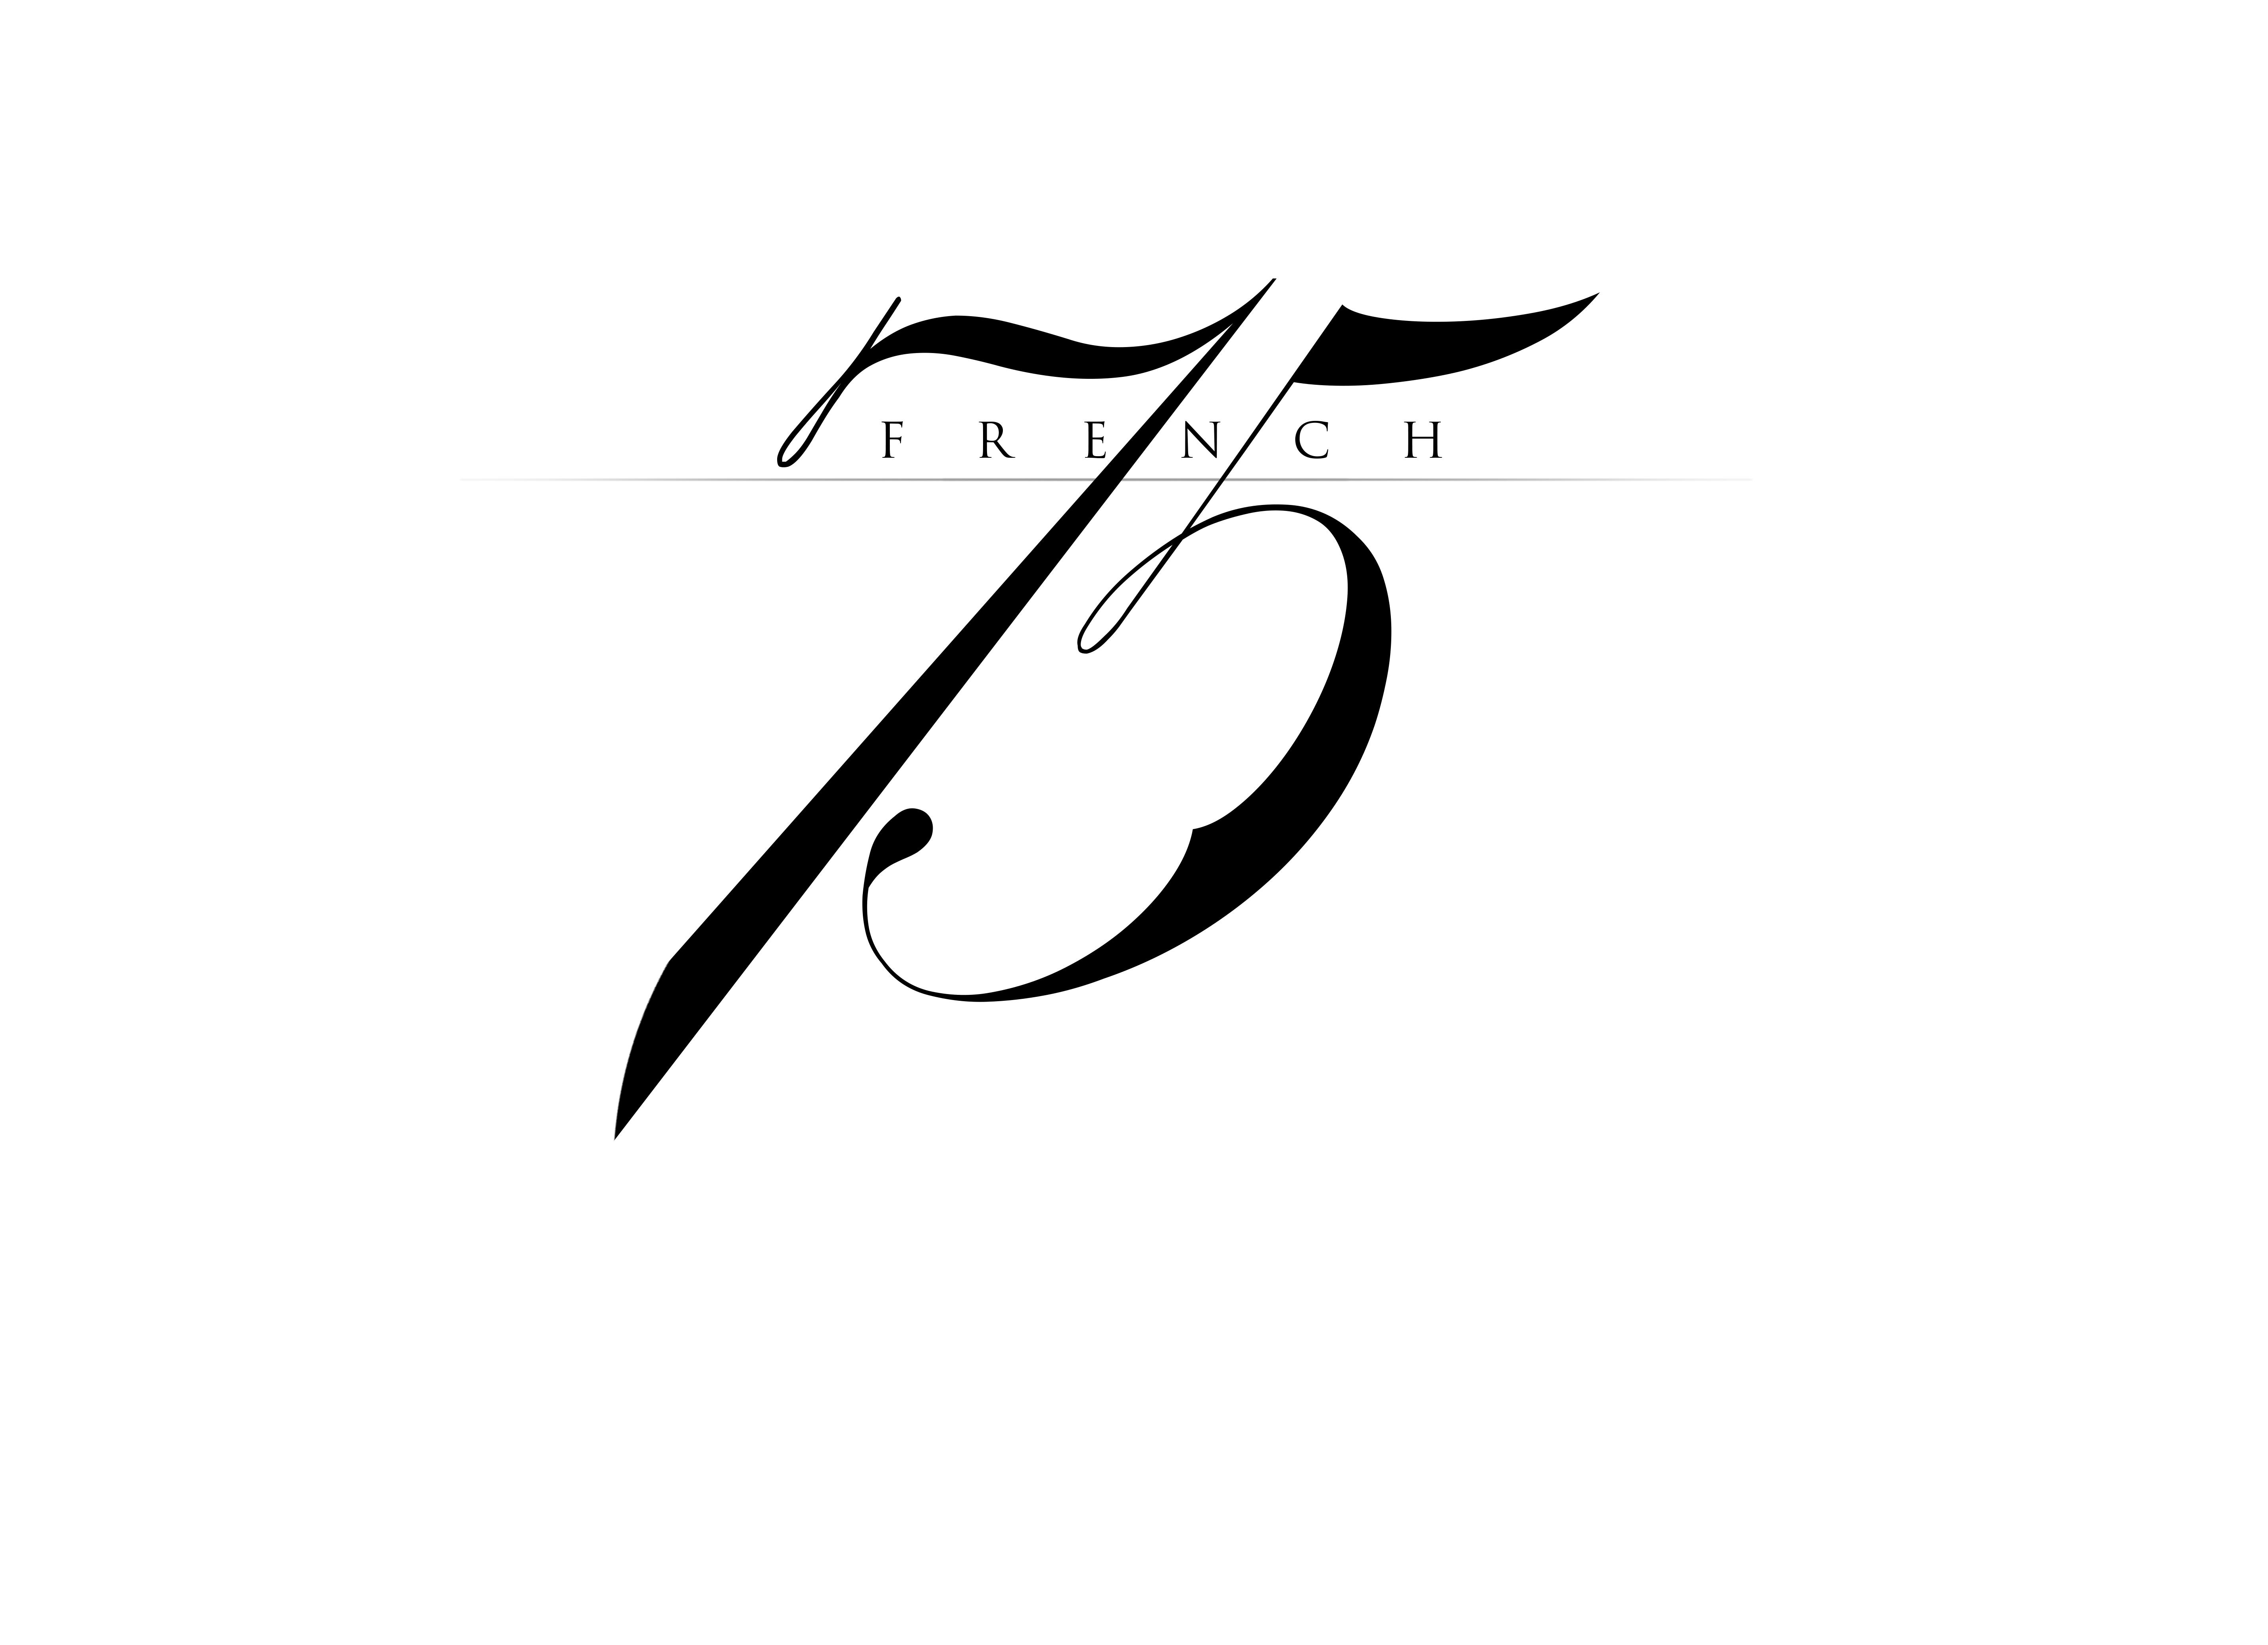 WHITE 75